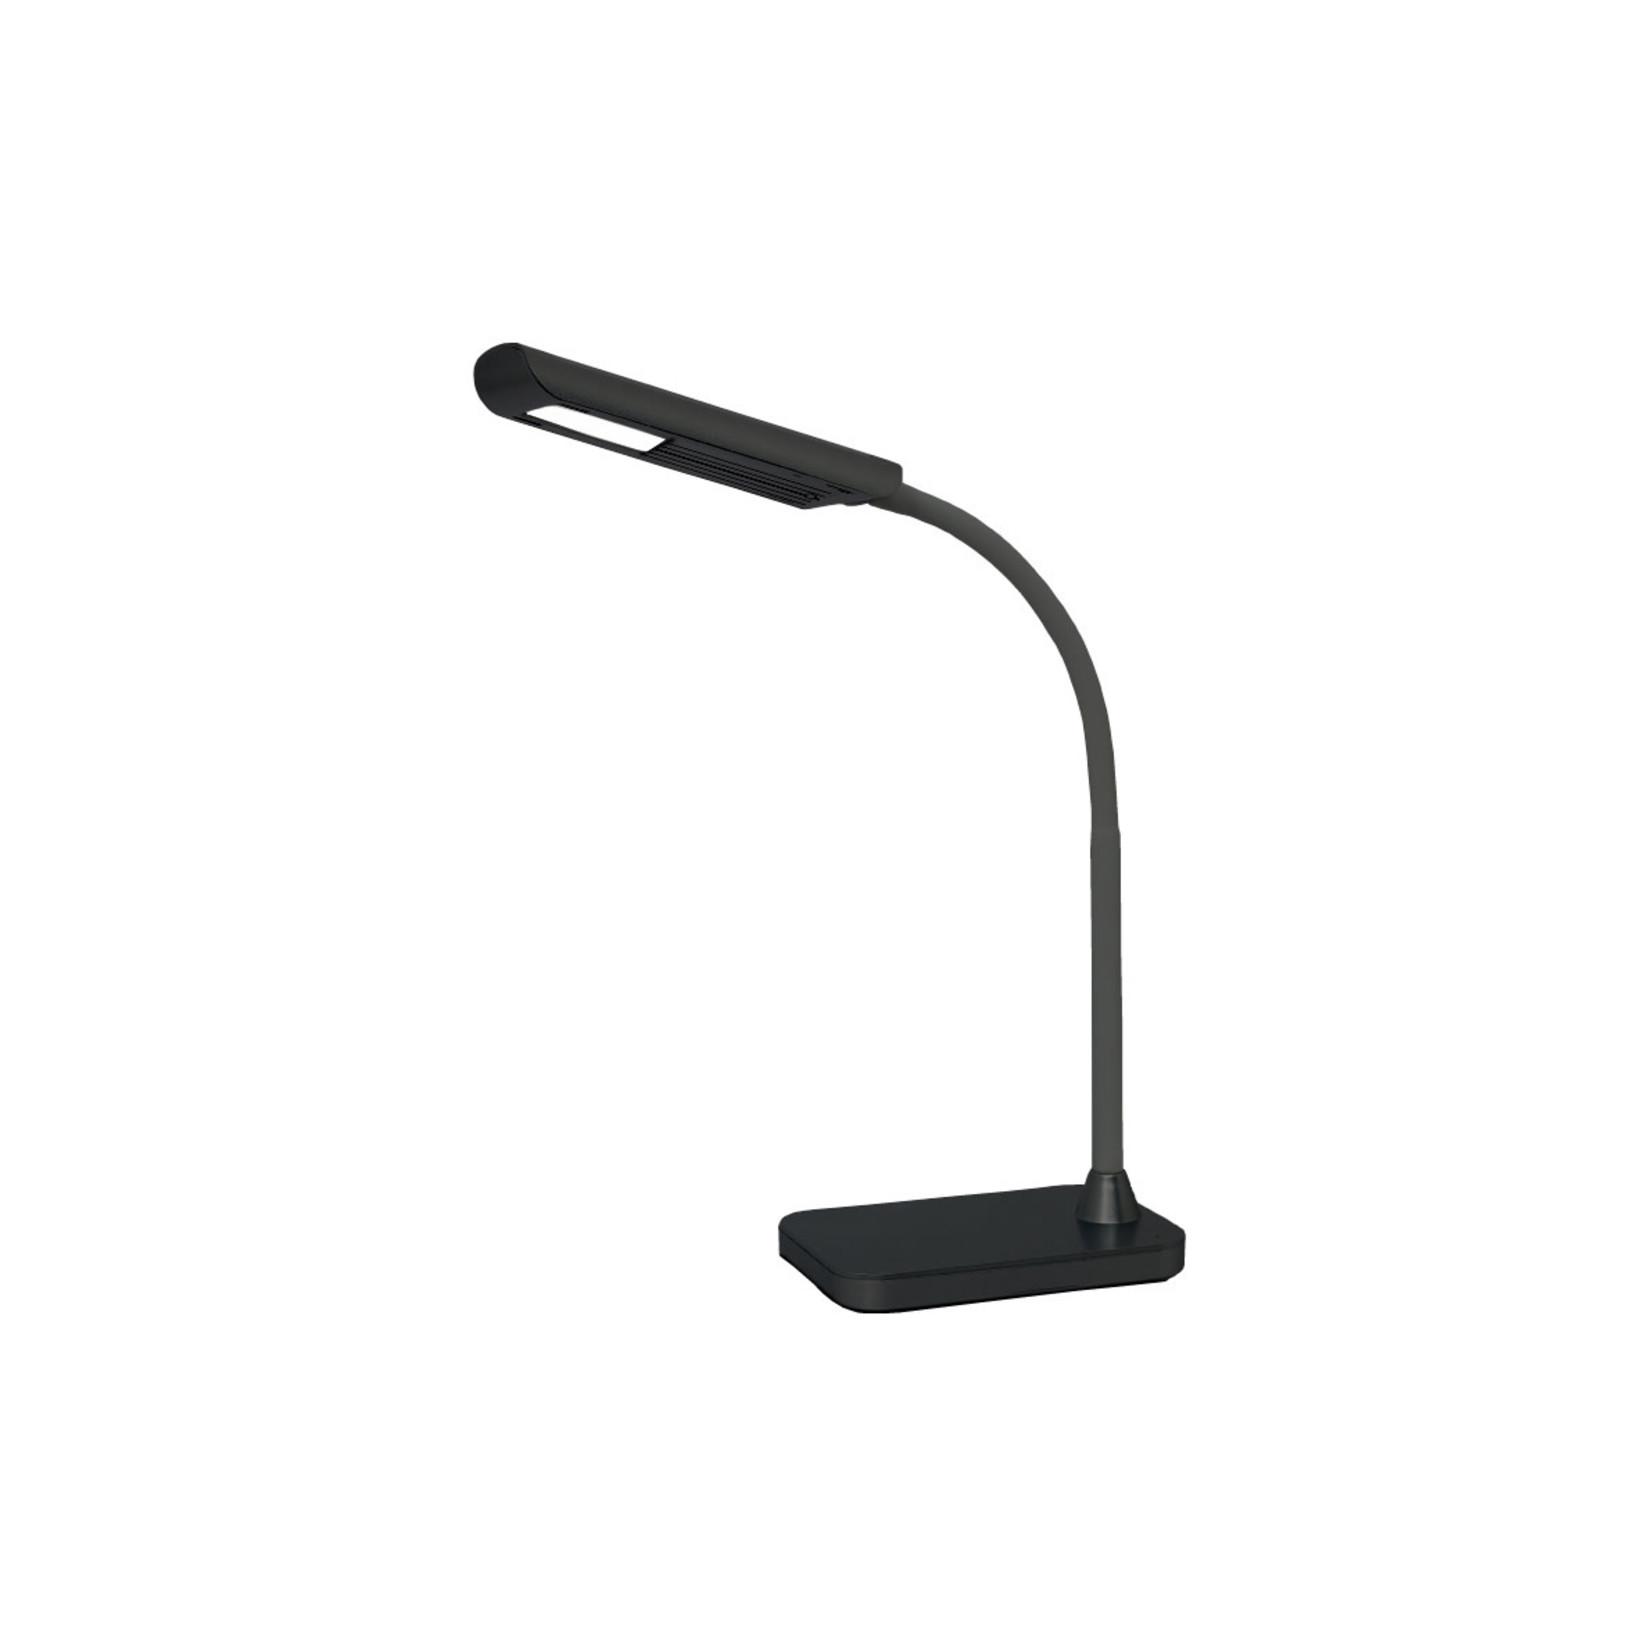 Shabbos Solution Or Li Shabbat Lamp - North American Model, Black